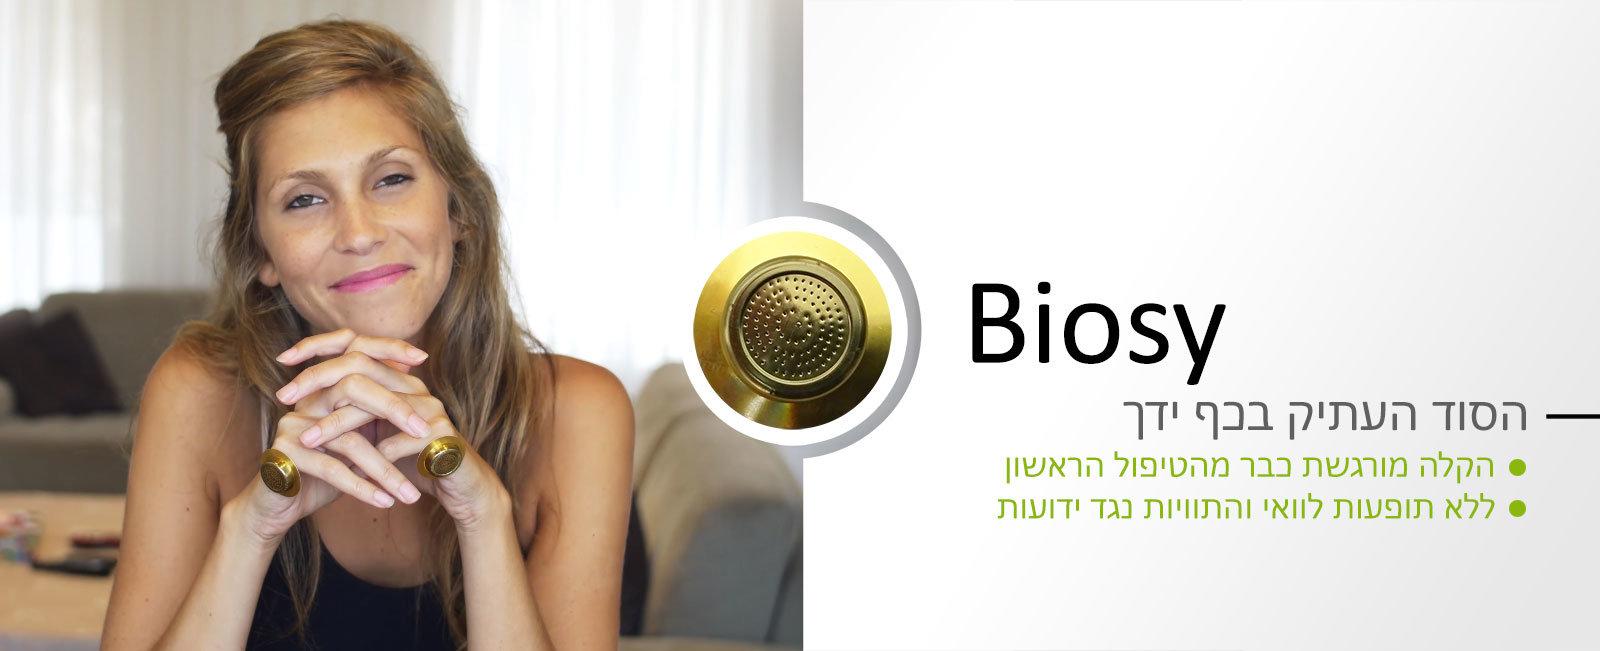 Biosy